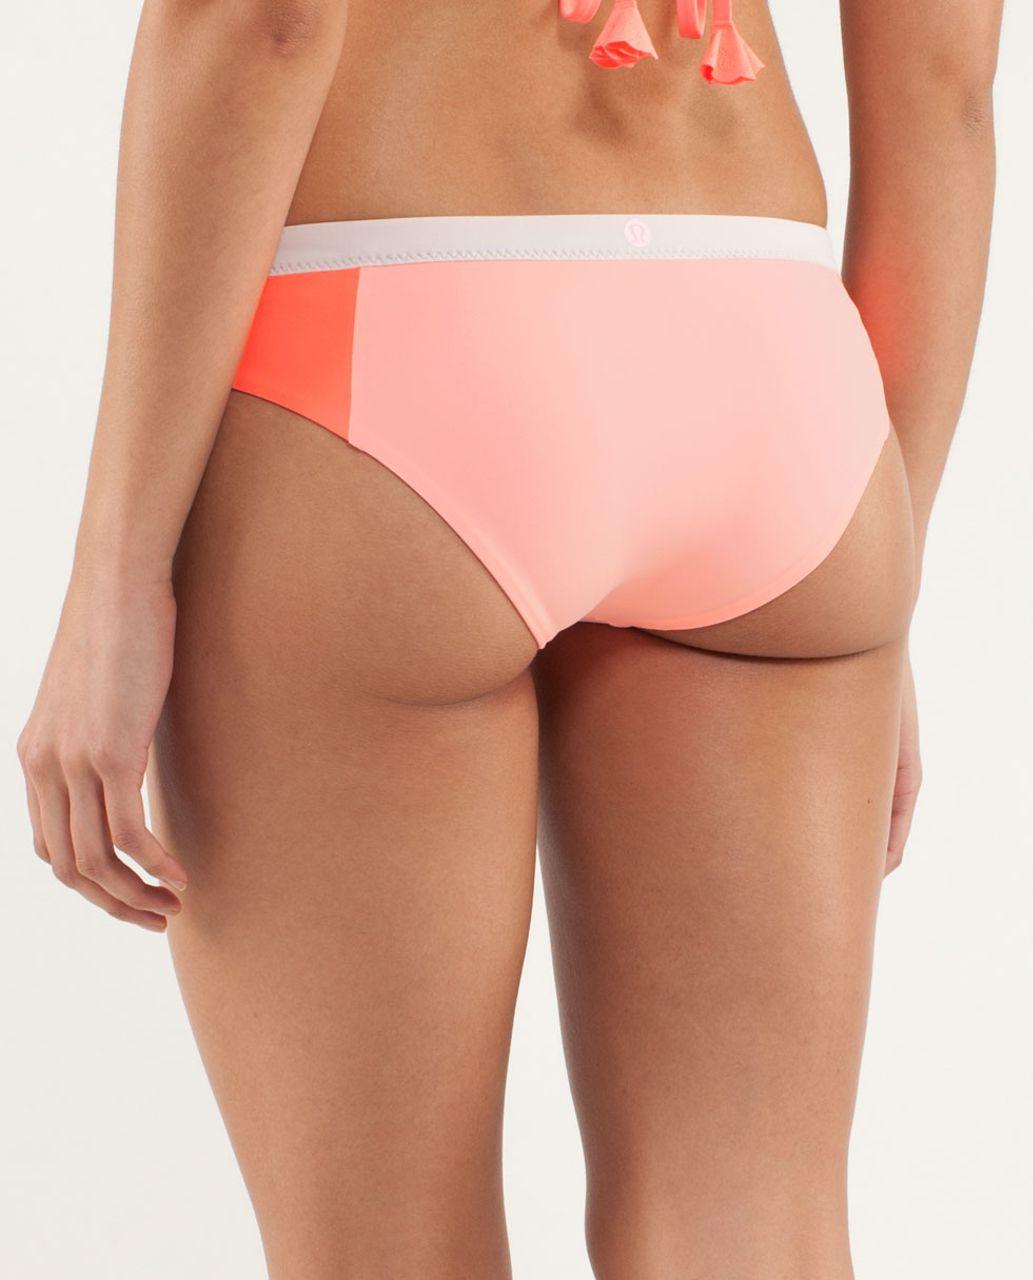 Lululemon Sandy Savasana Bottom - Dune / Bleached Coral / Pop Orange